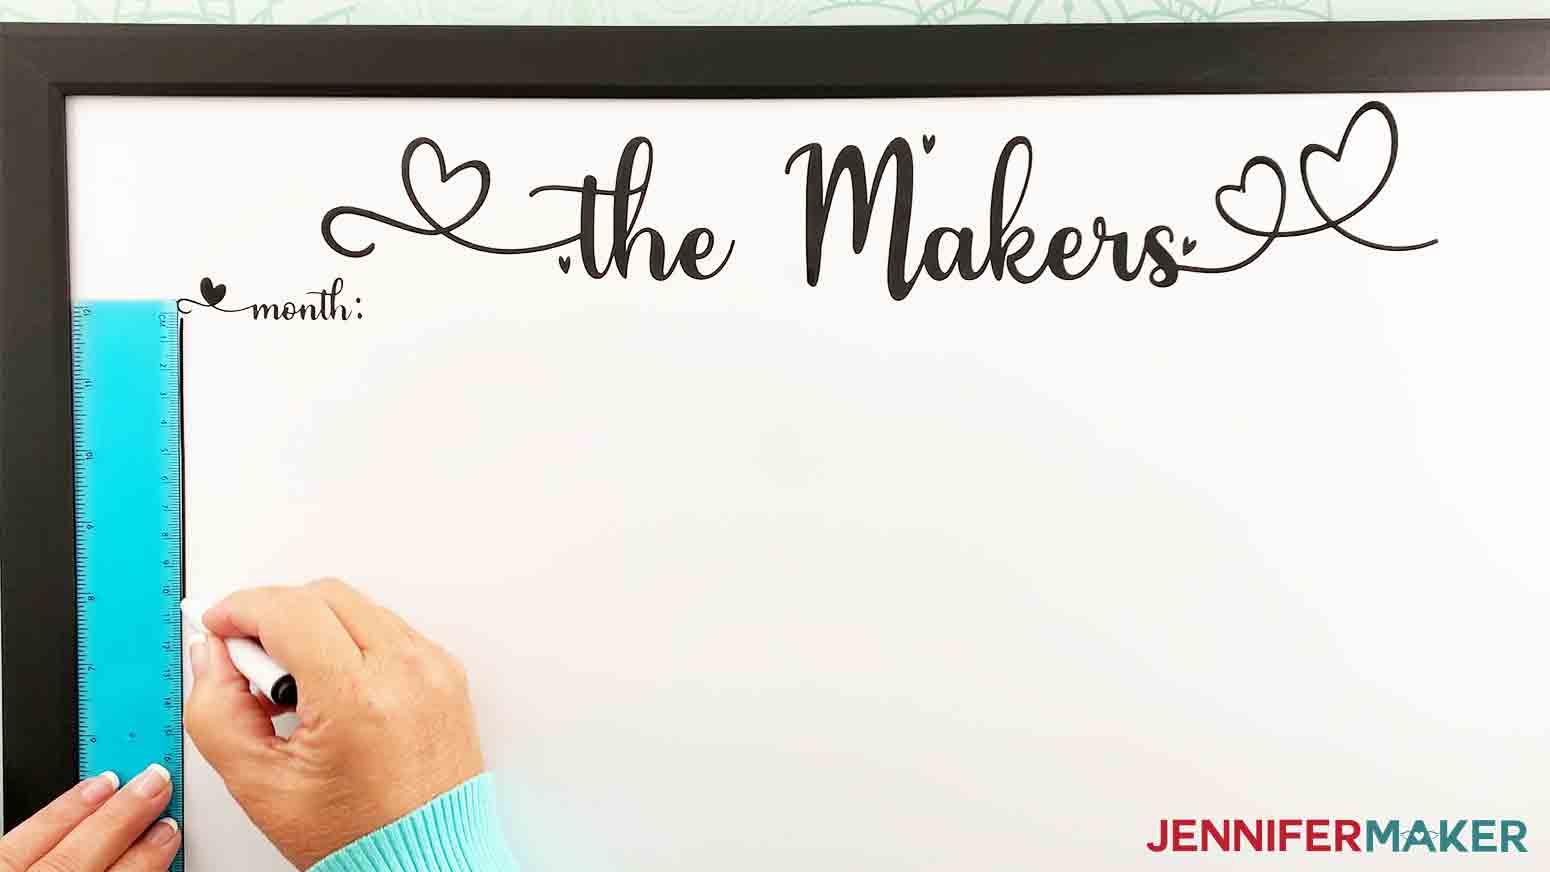 DIY-Whiteboard-Calendar-JenniferMaker-measure-and-mark-spot-for-vinyl-calendar-placement